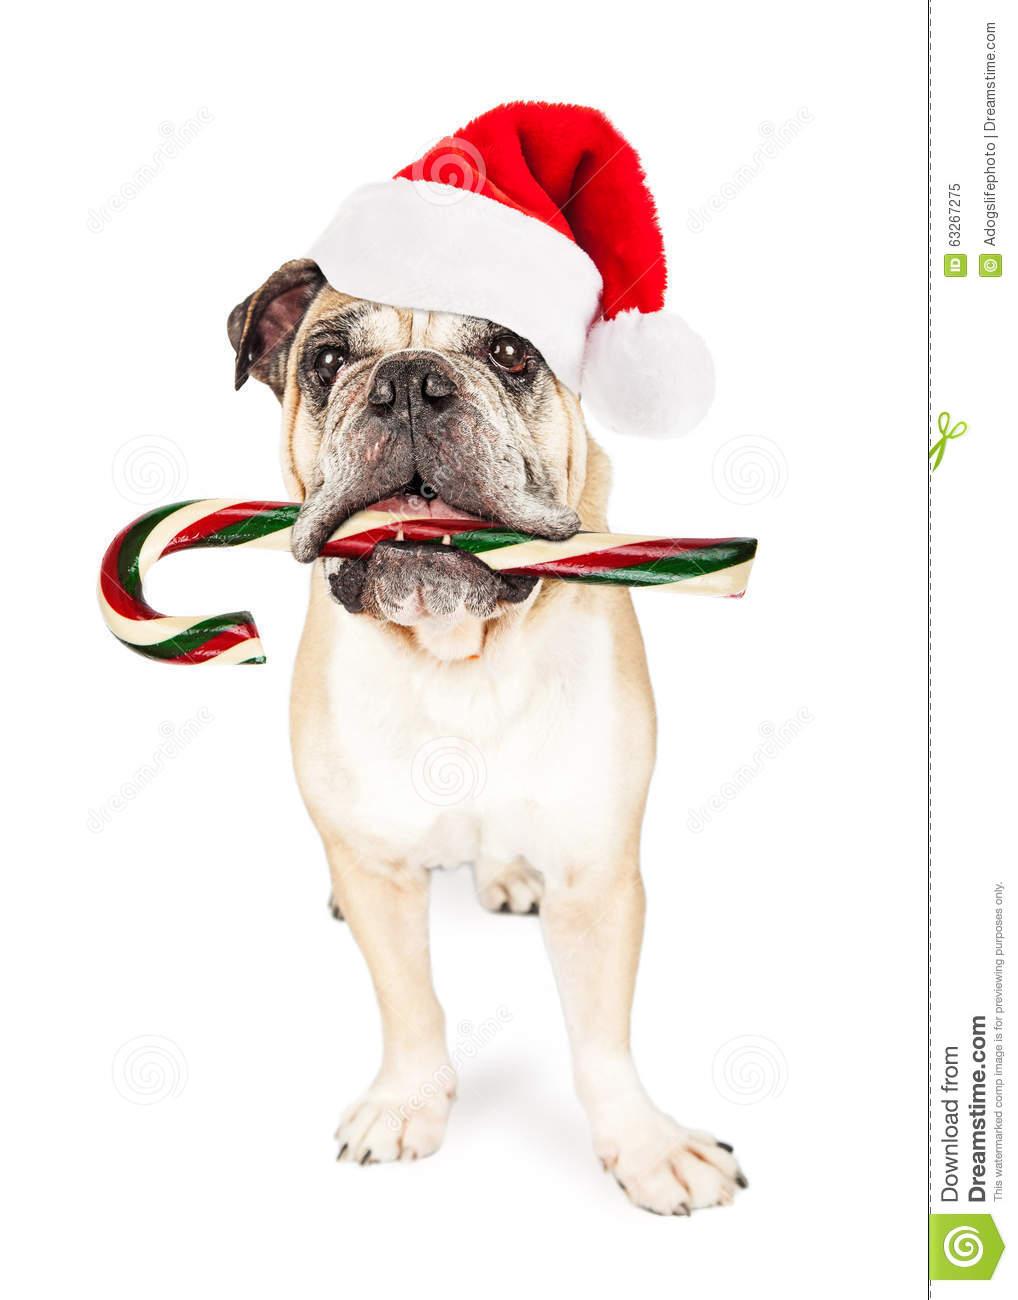 Christmas Bulldog Eating Candy Cane Stock Photo.